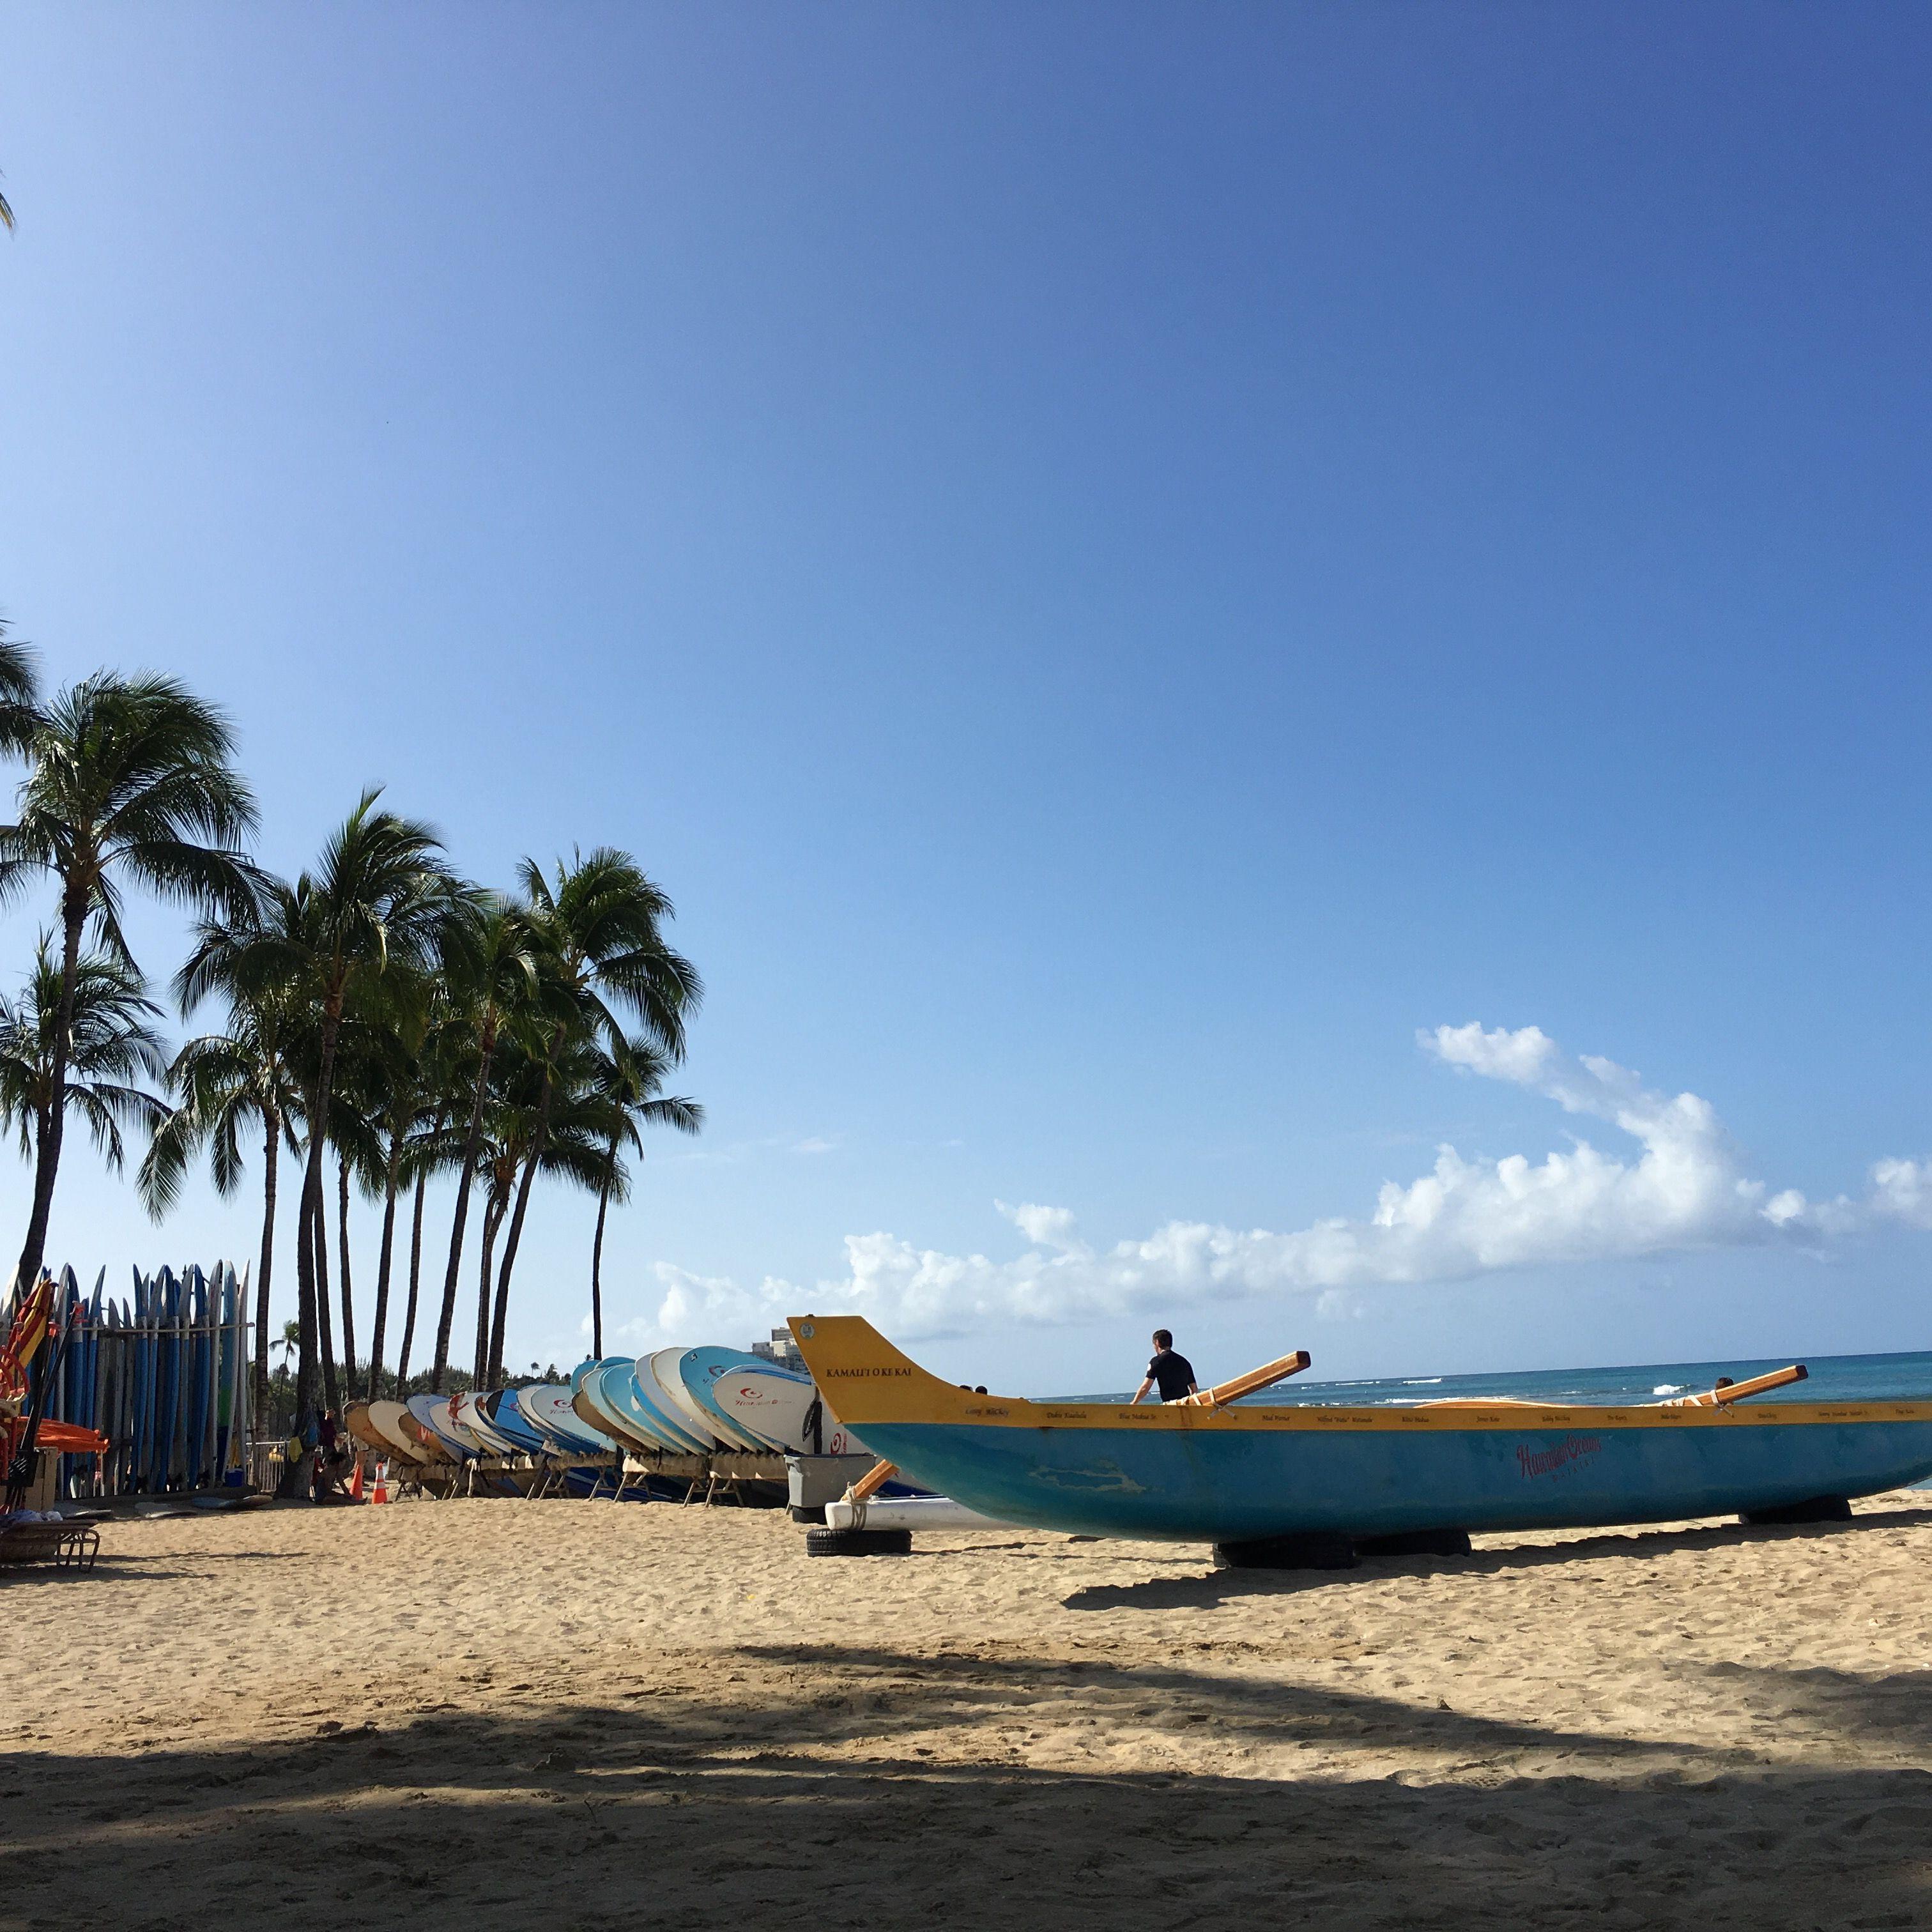 Never Sick of the Food, Weather, Beach: Oahu, Hawaii   코리일보   CoreeILBO